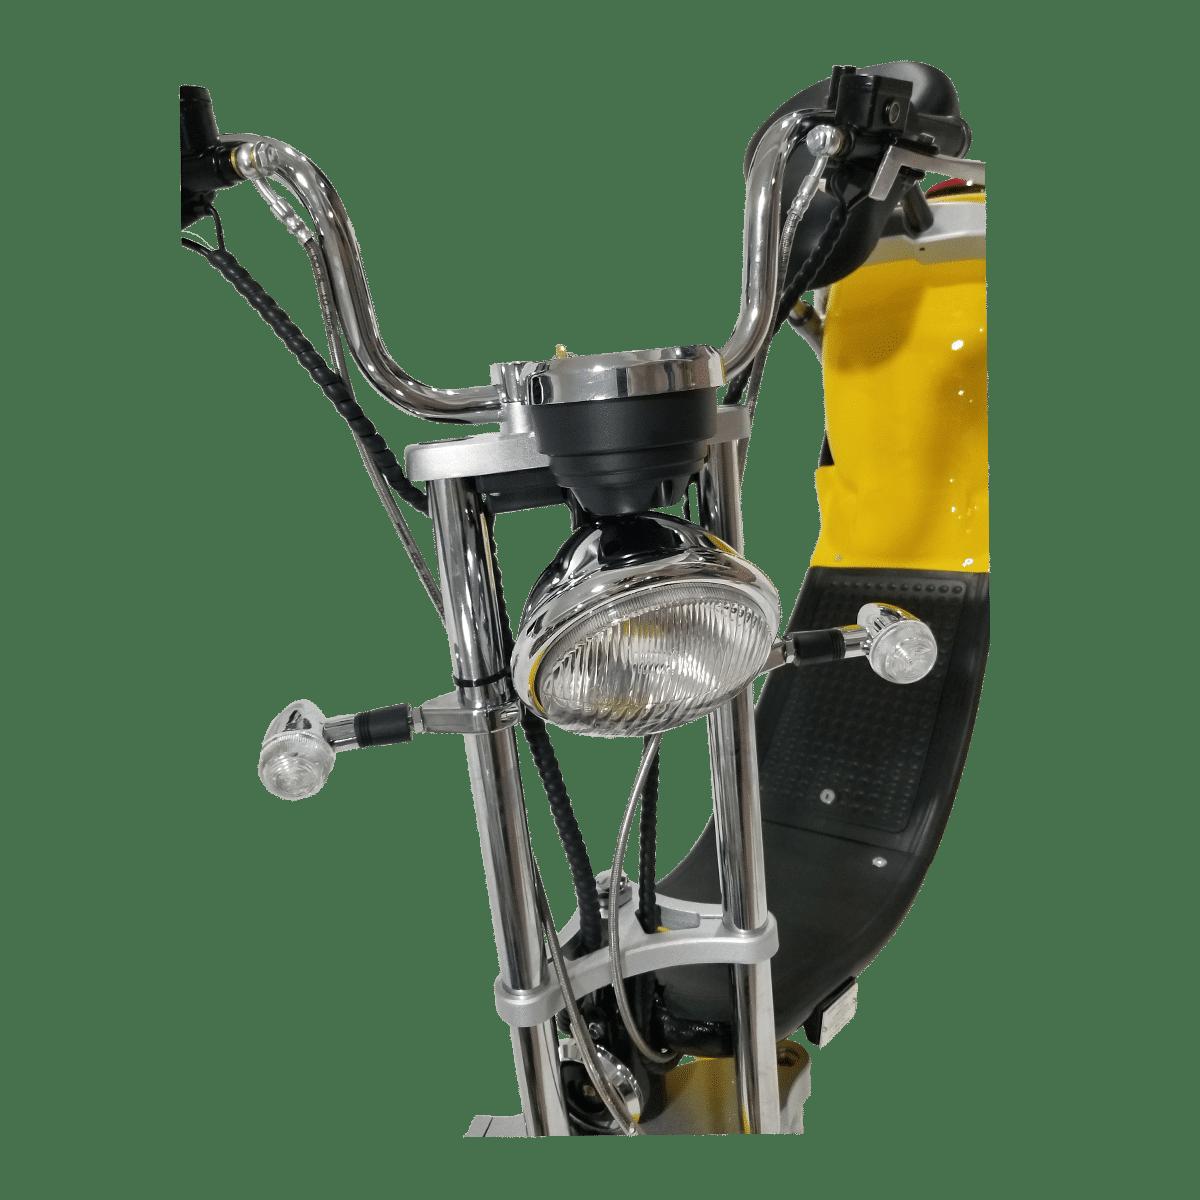 Citycoco Harley Deluxe Jaune avec 1 batterie offerte en plus 19